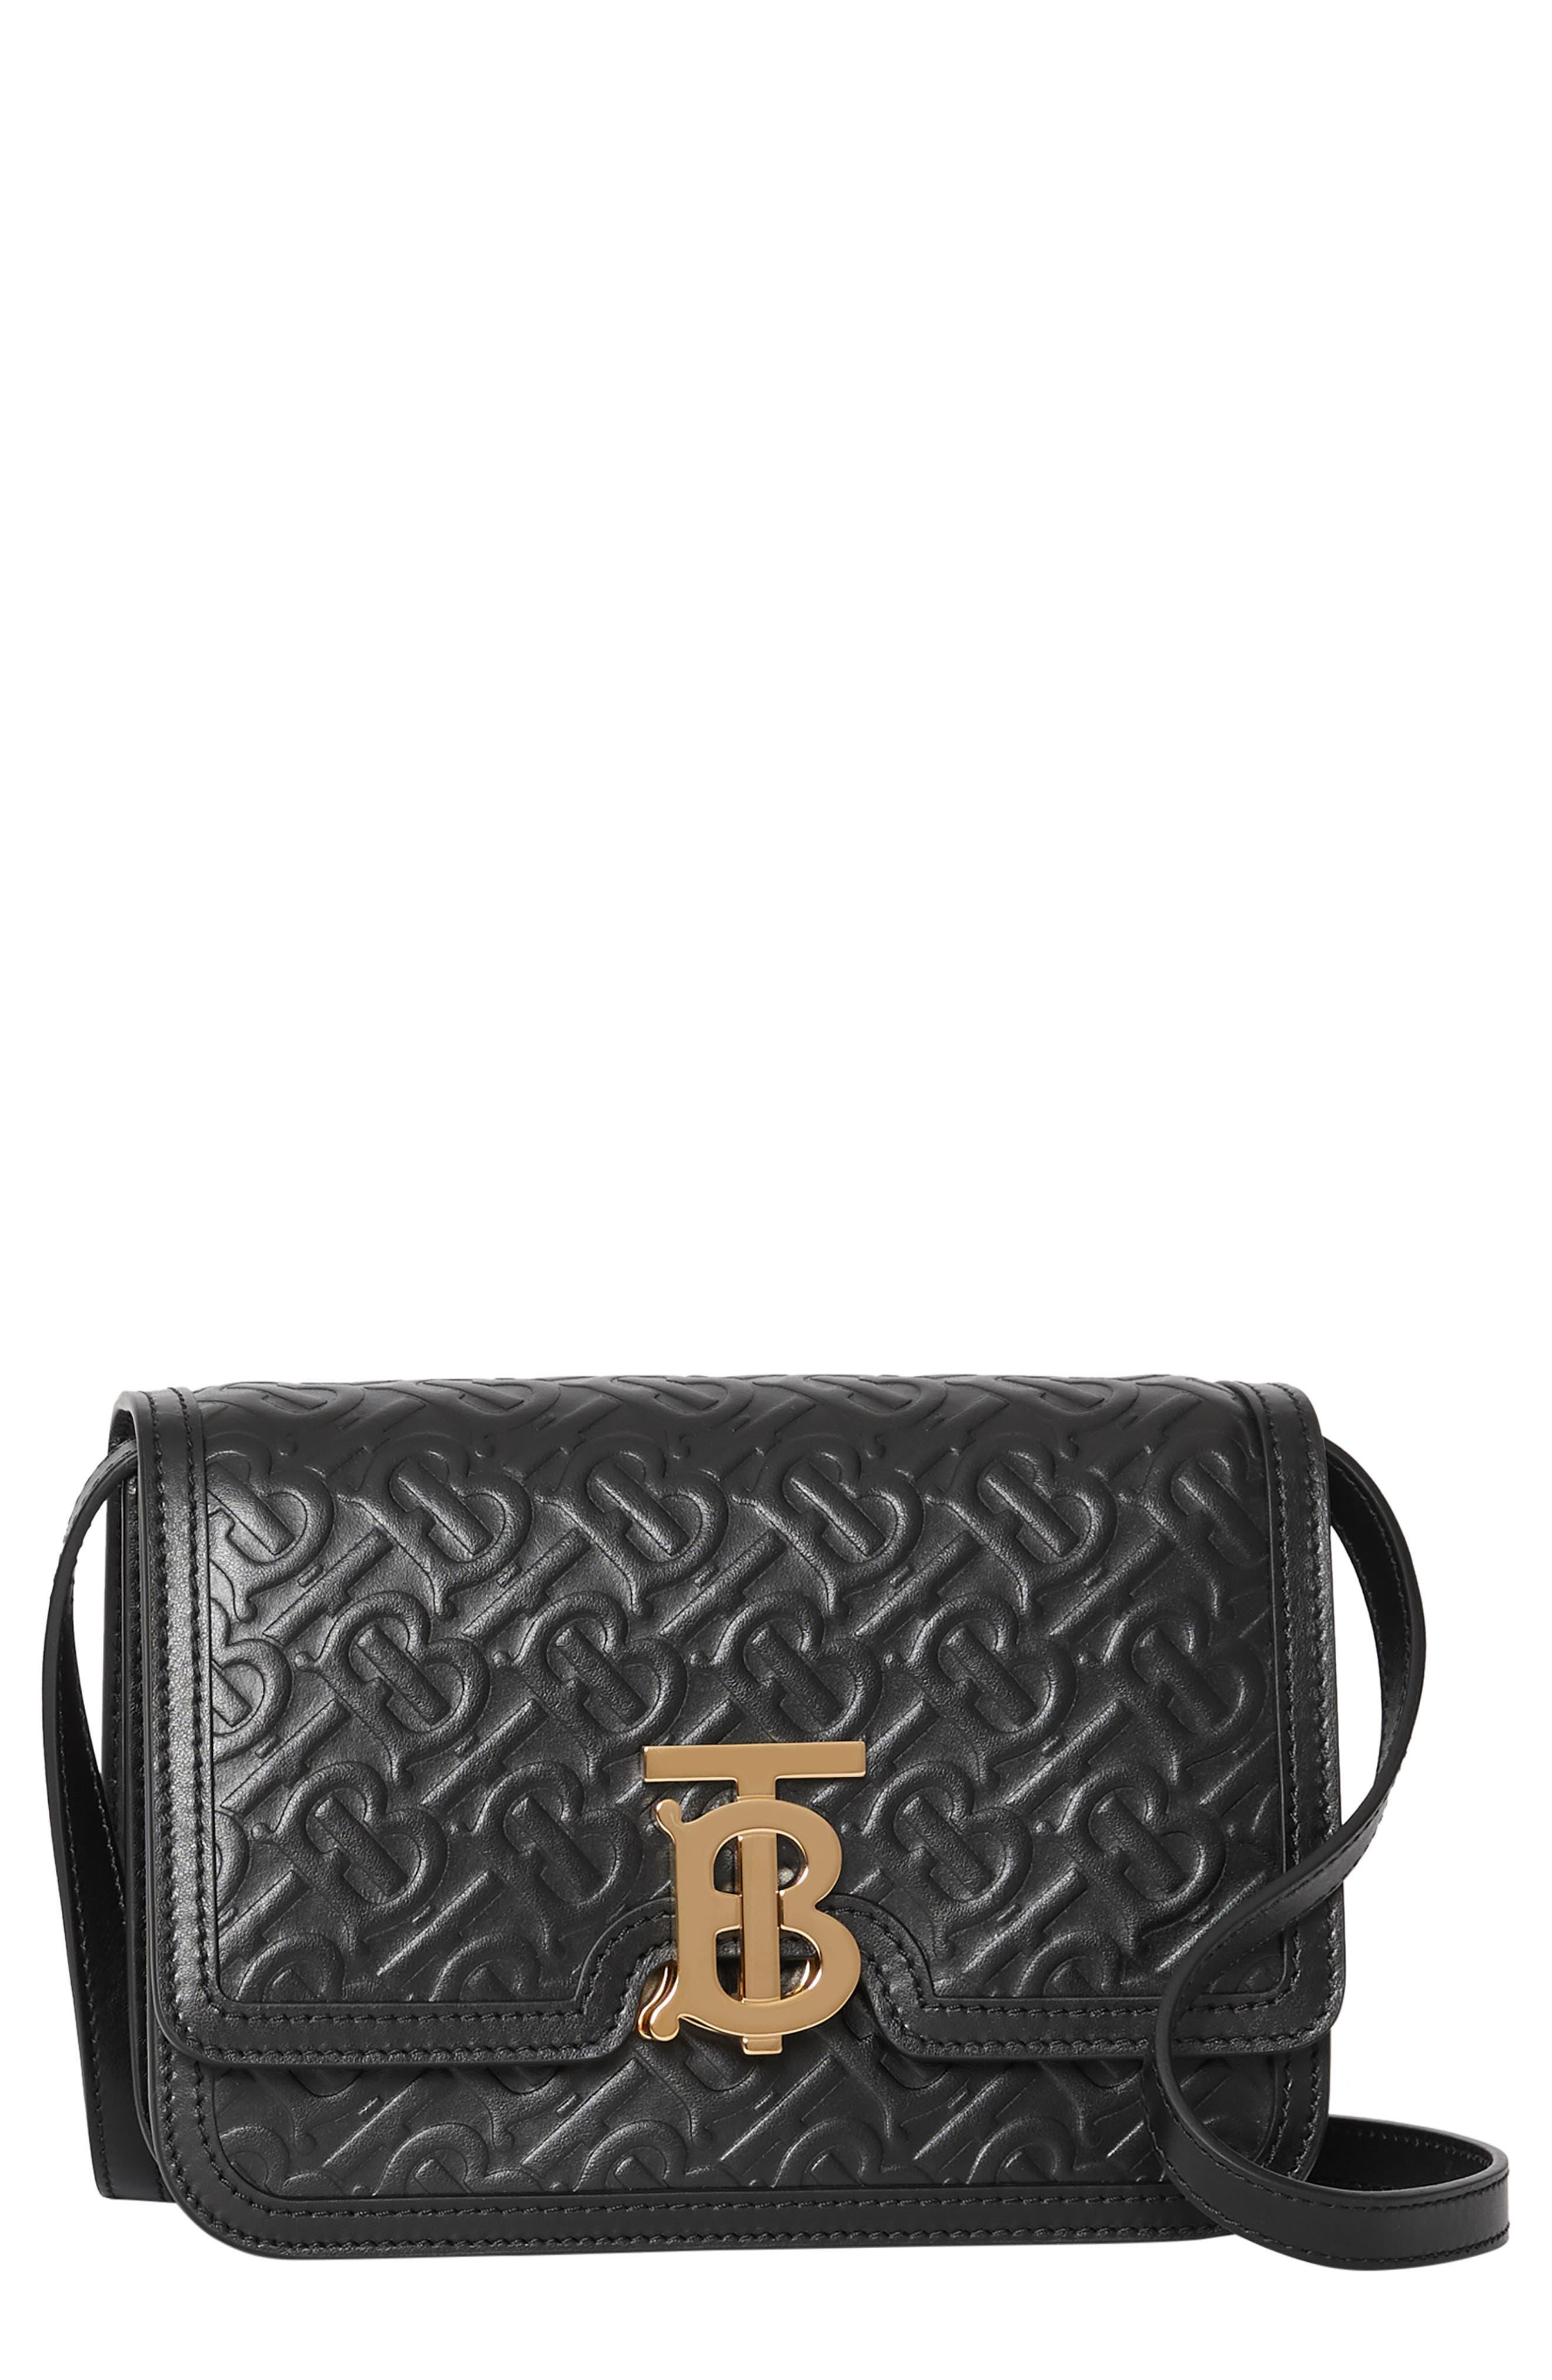 BURBERRY Small Monogram Leather TB Bag, Main, color, BLACK